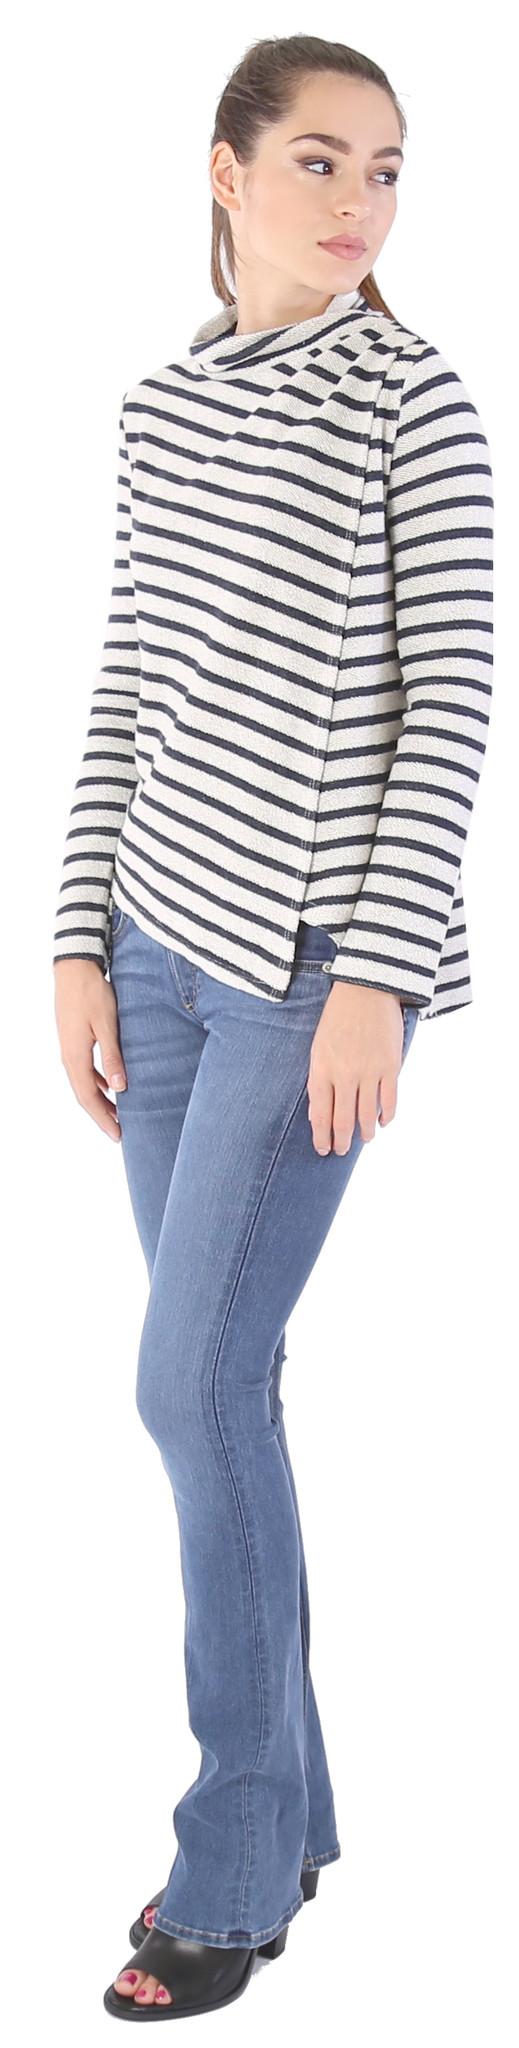 Shay & Coco Asymmetrical Zip Cardigan in White & Navy Stripe